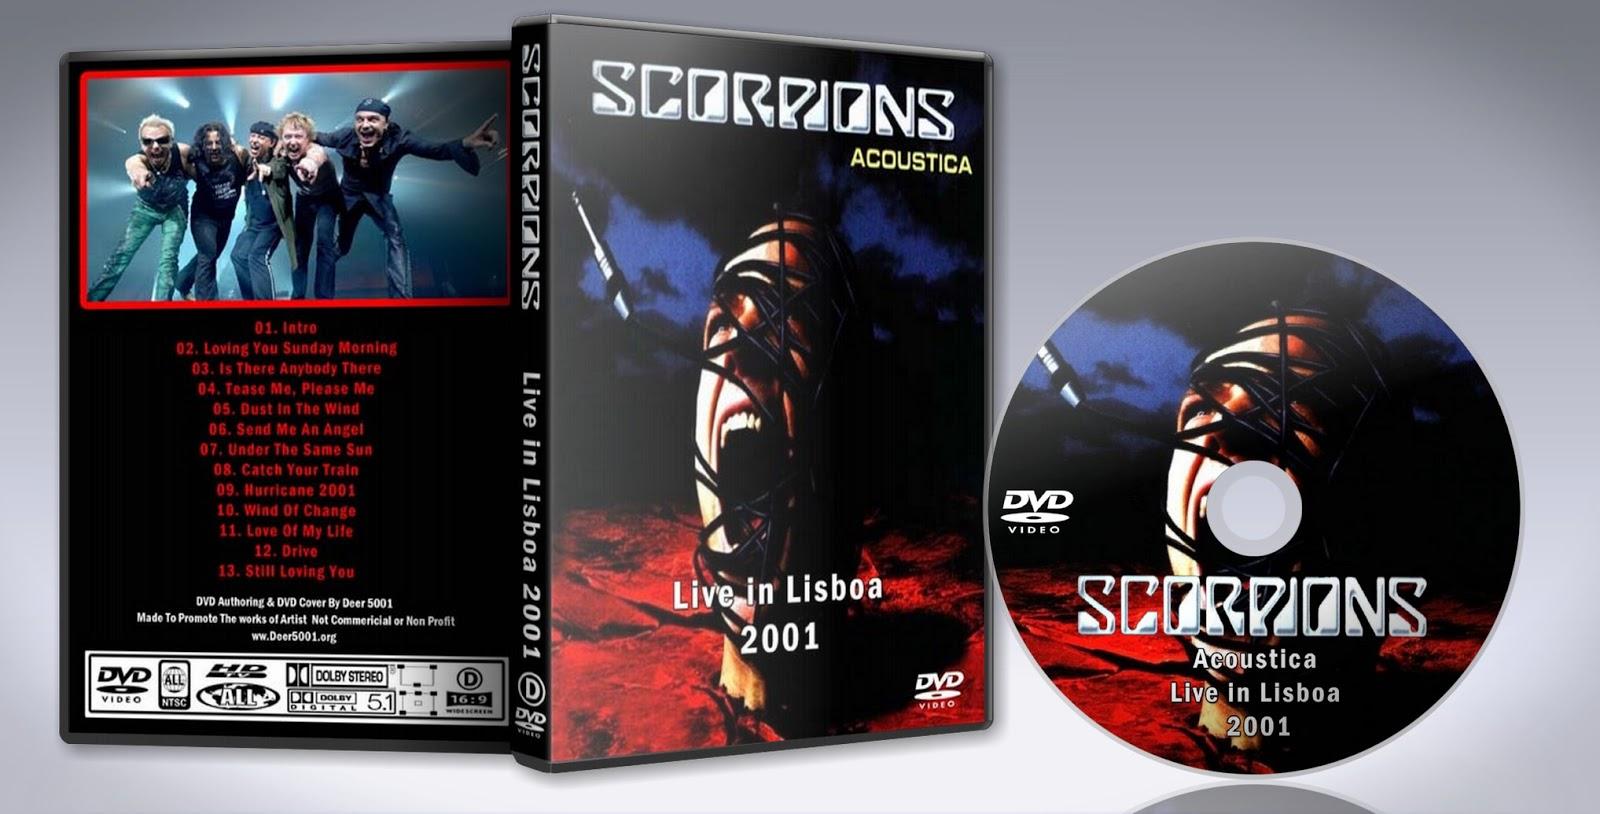 dvd do scorpions acoustica